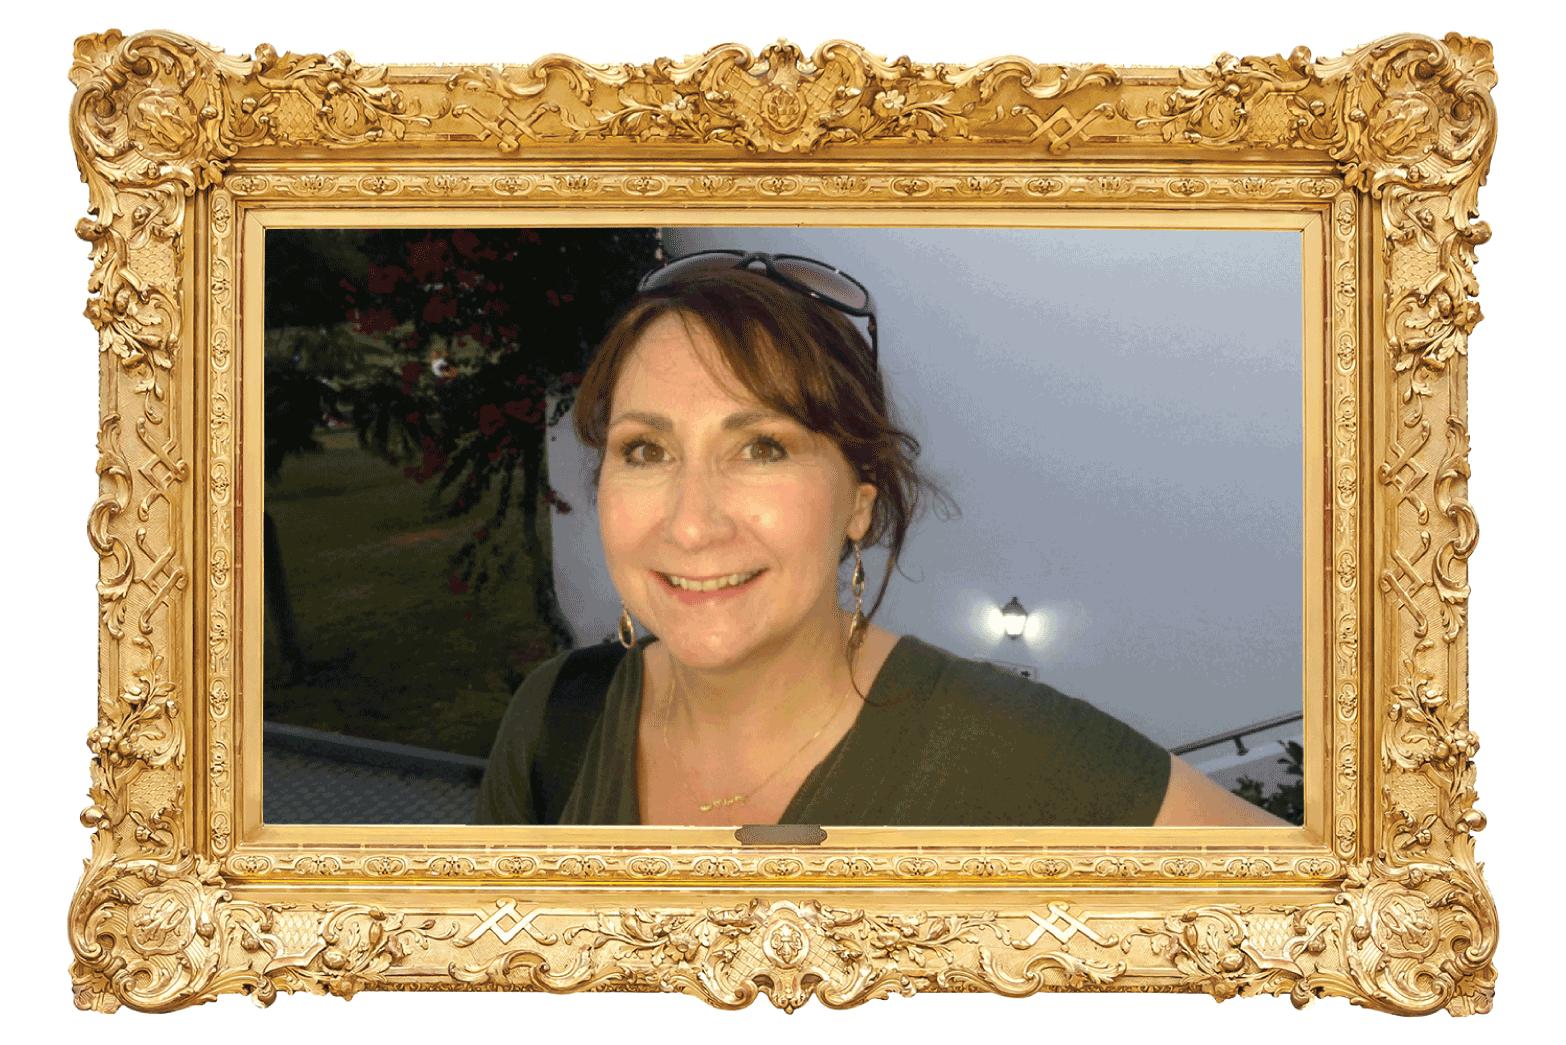 Fiona Kasprzak Beauty Therapist in Dunfermline at Clarity House